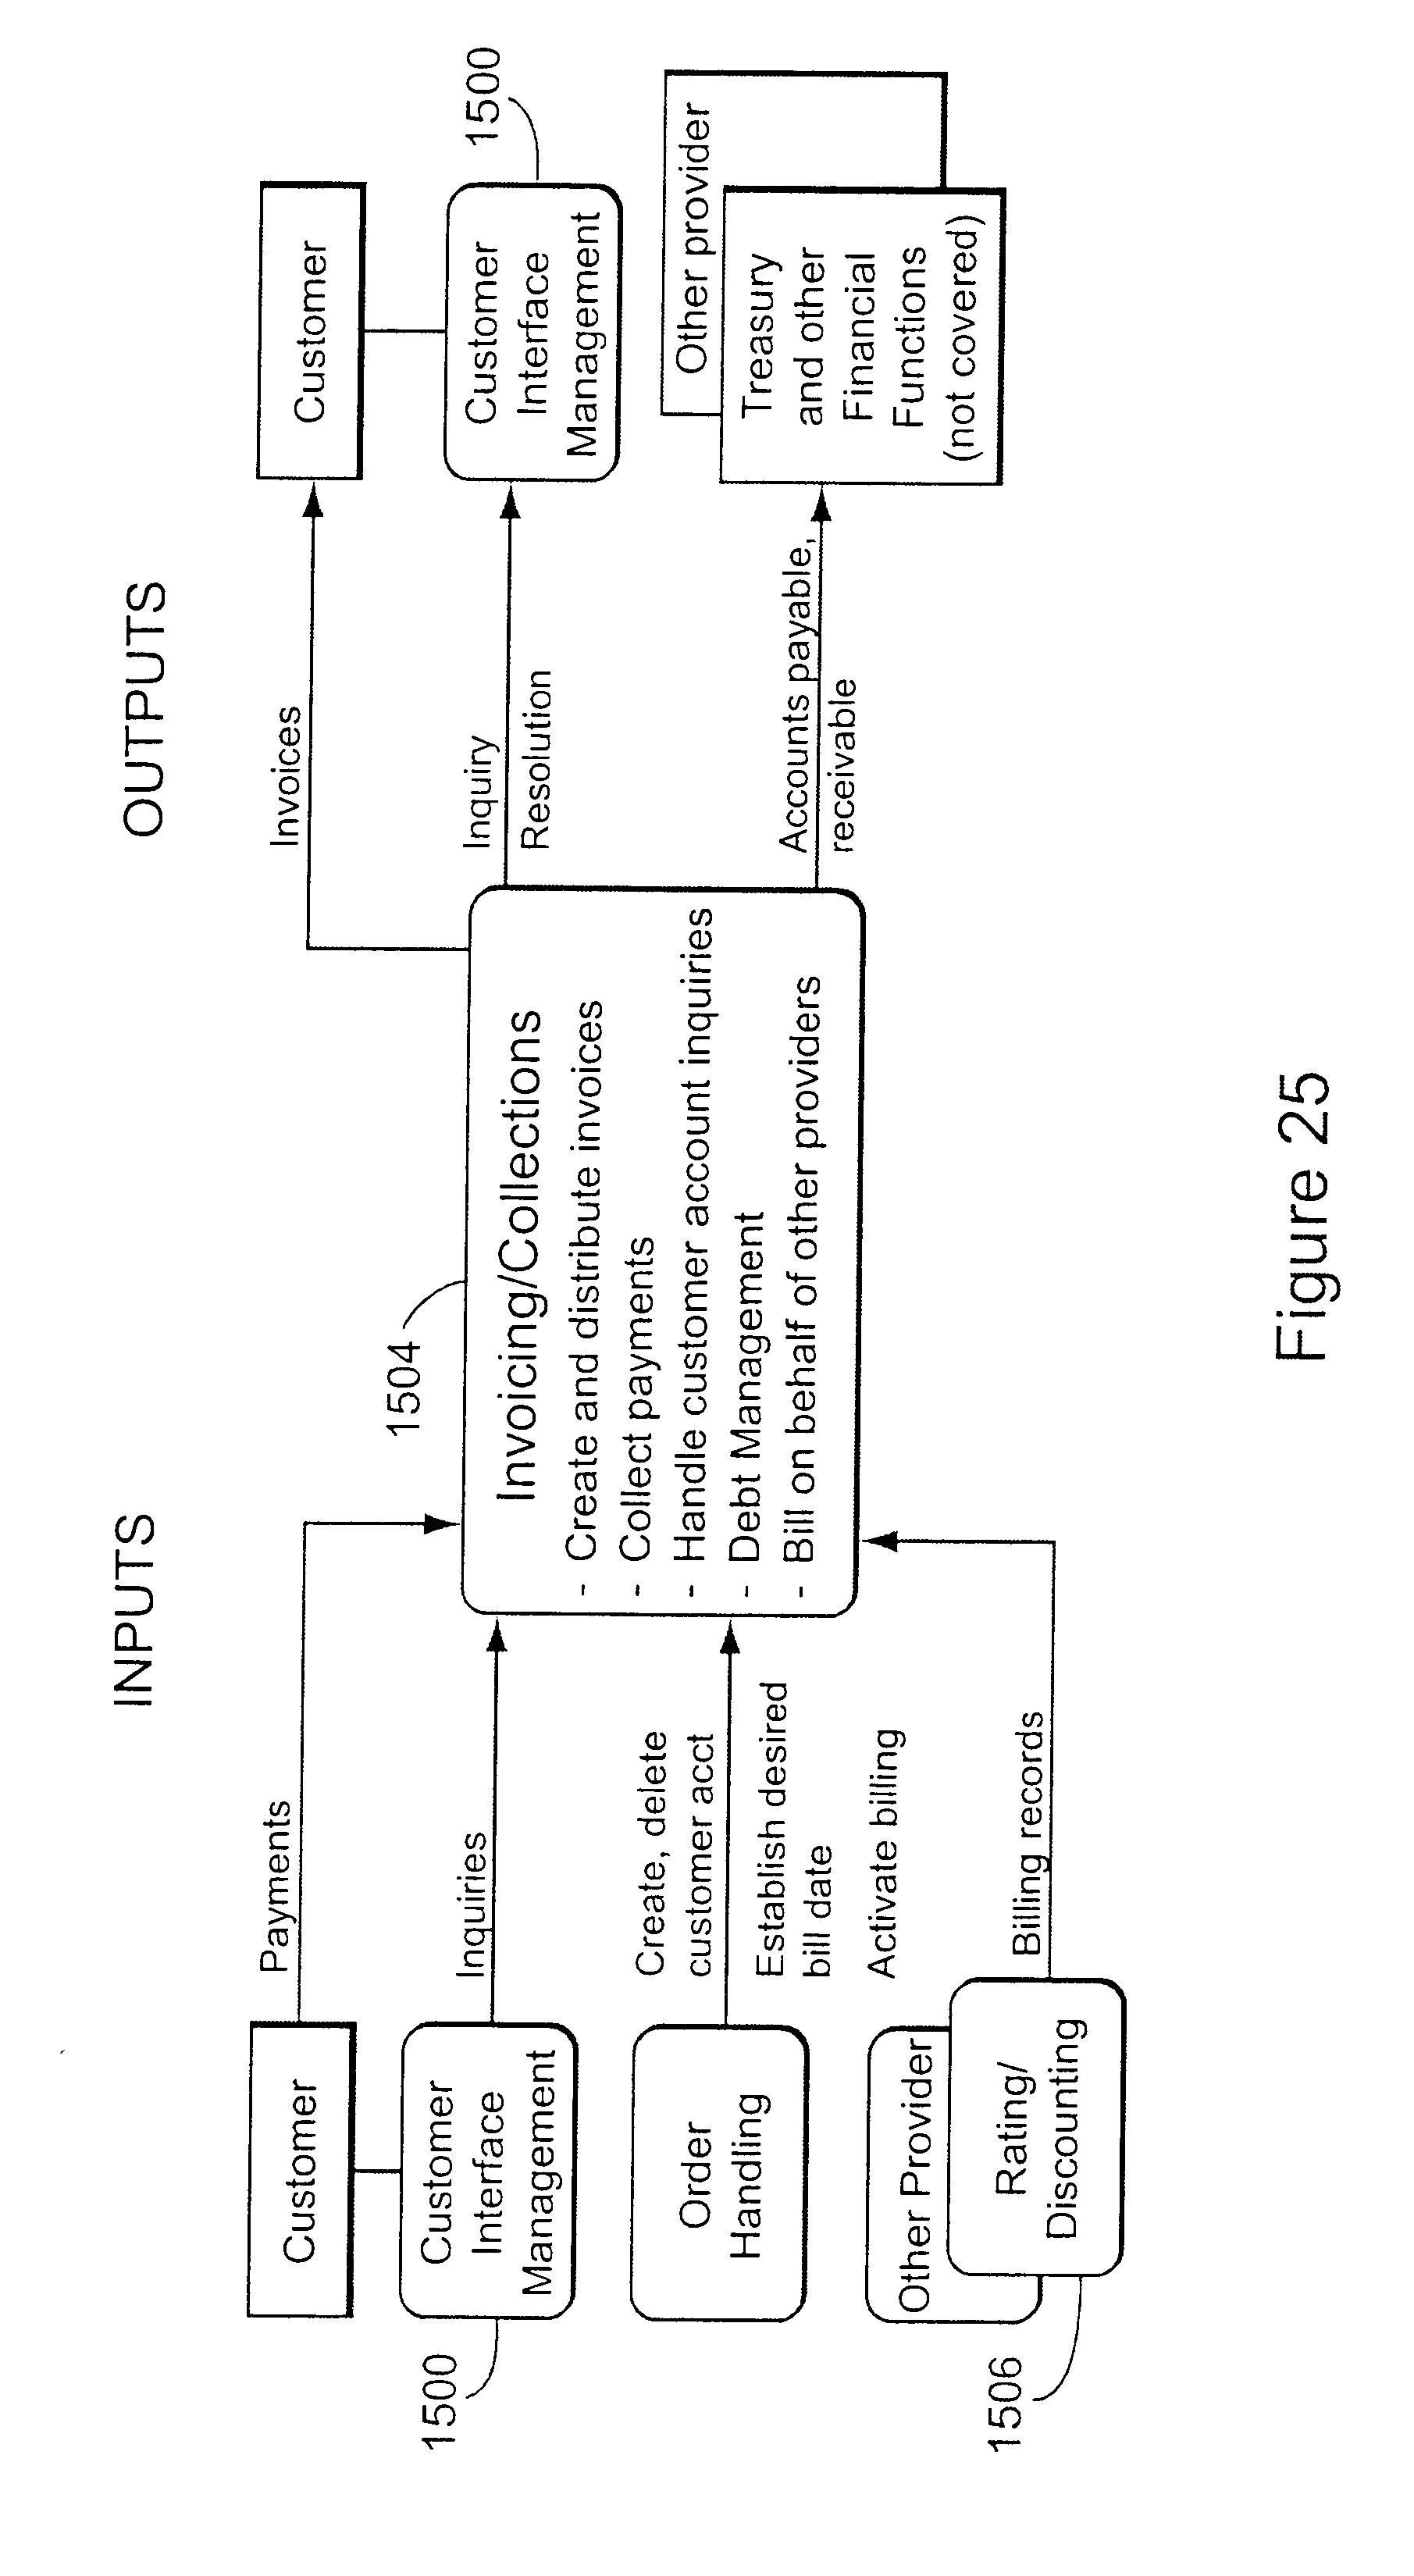 Patent Us 6606744 B1 Cb Radio Mic Wiring Diagrams Likewise Speakon Cable Diagram Images